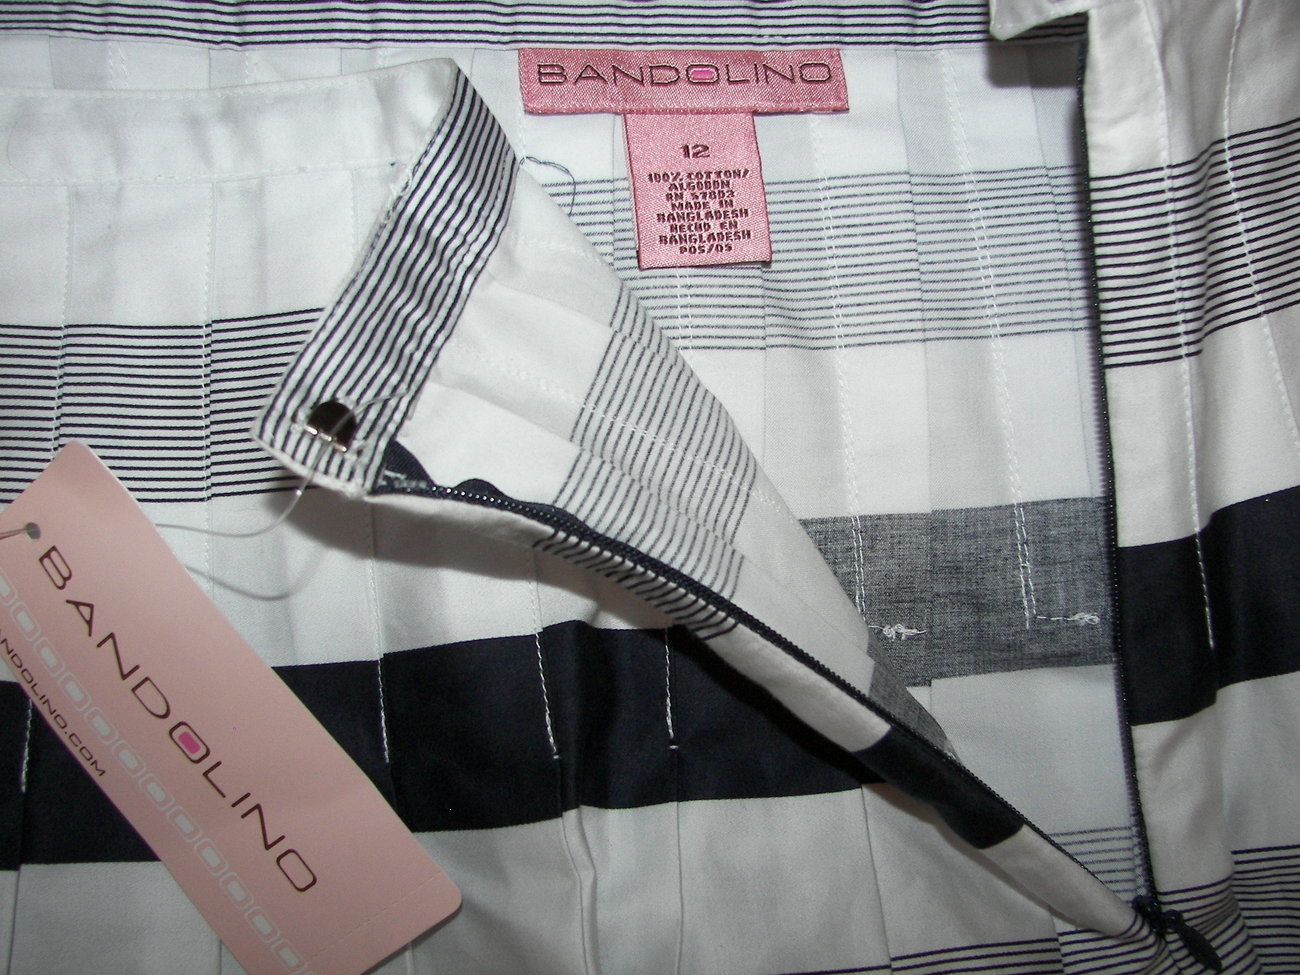 Bandolino Pleated Skirt Size 12 Brand New